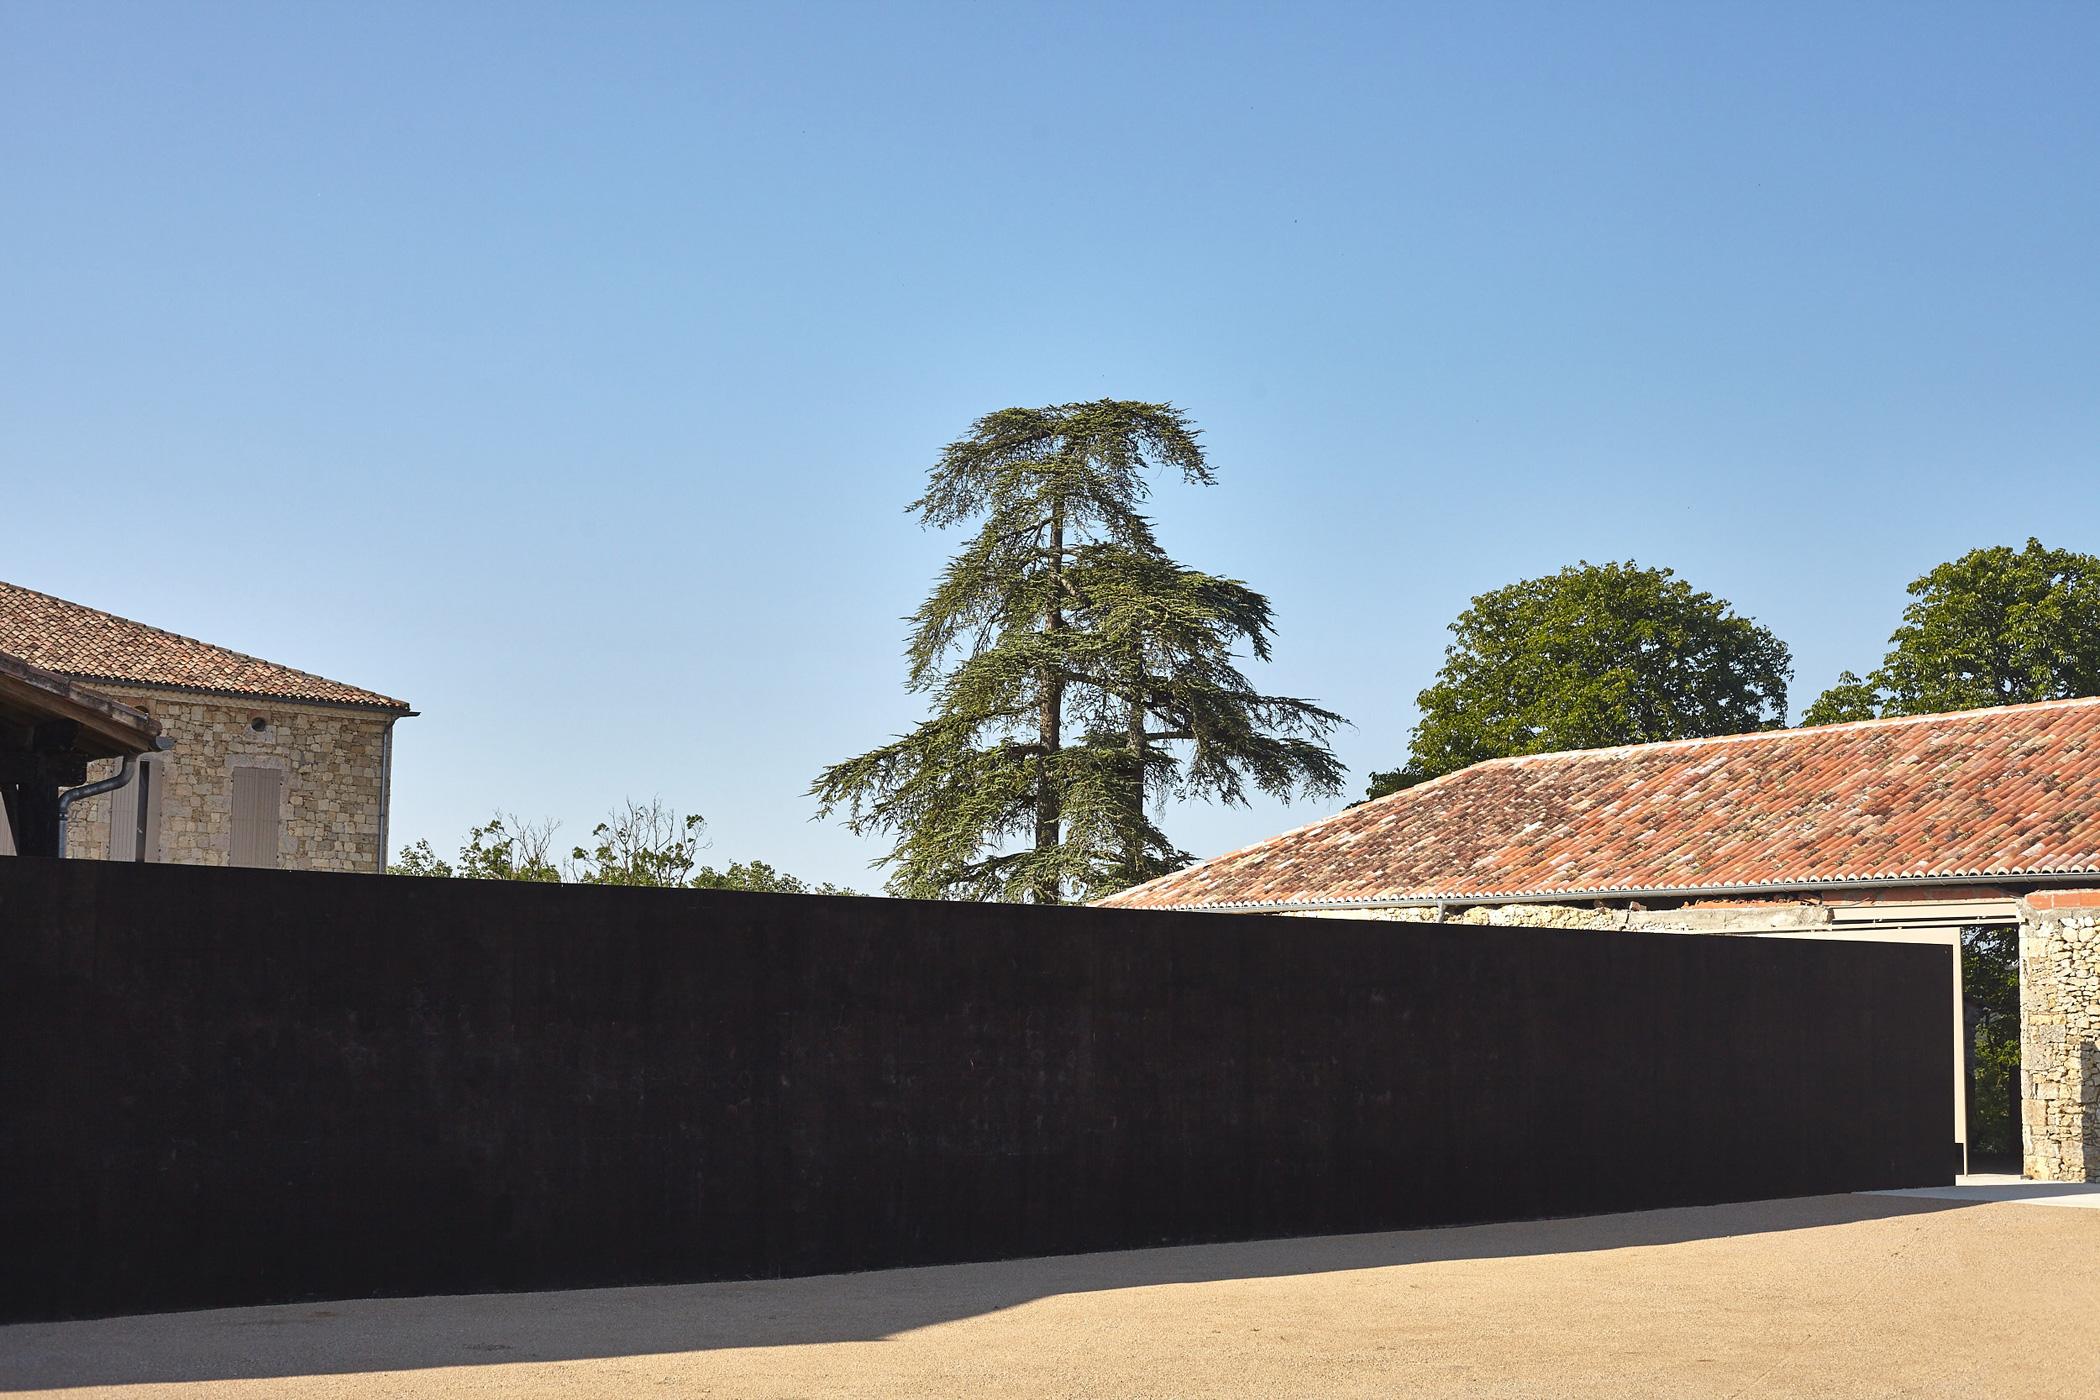 Engalin_Gascony_France_8932.jpg